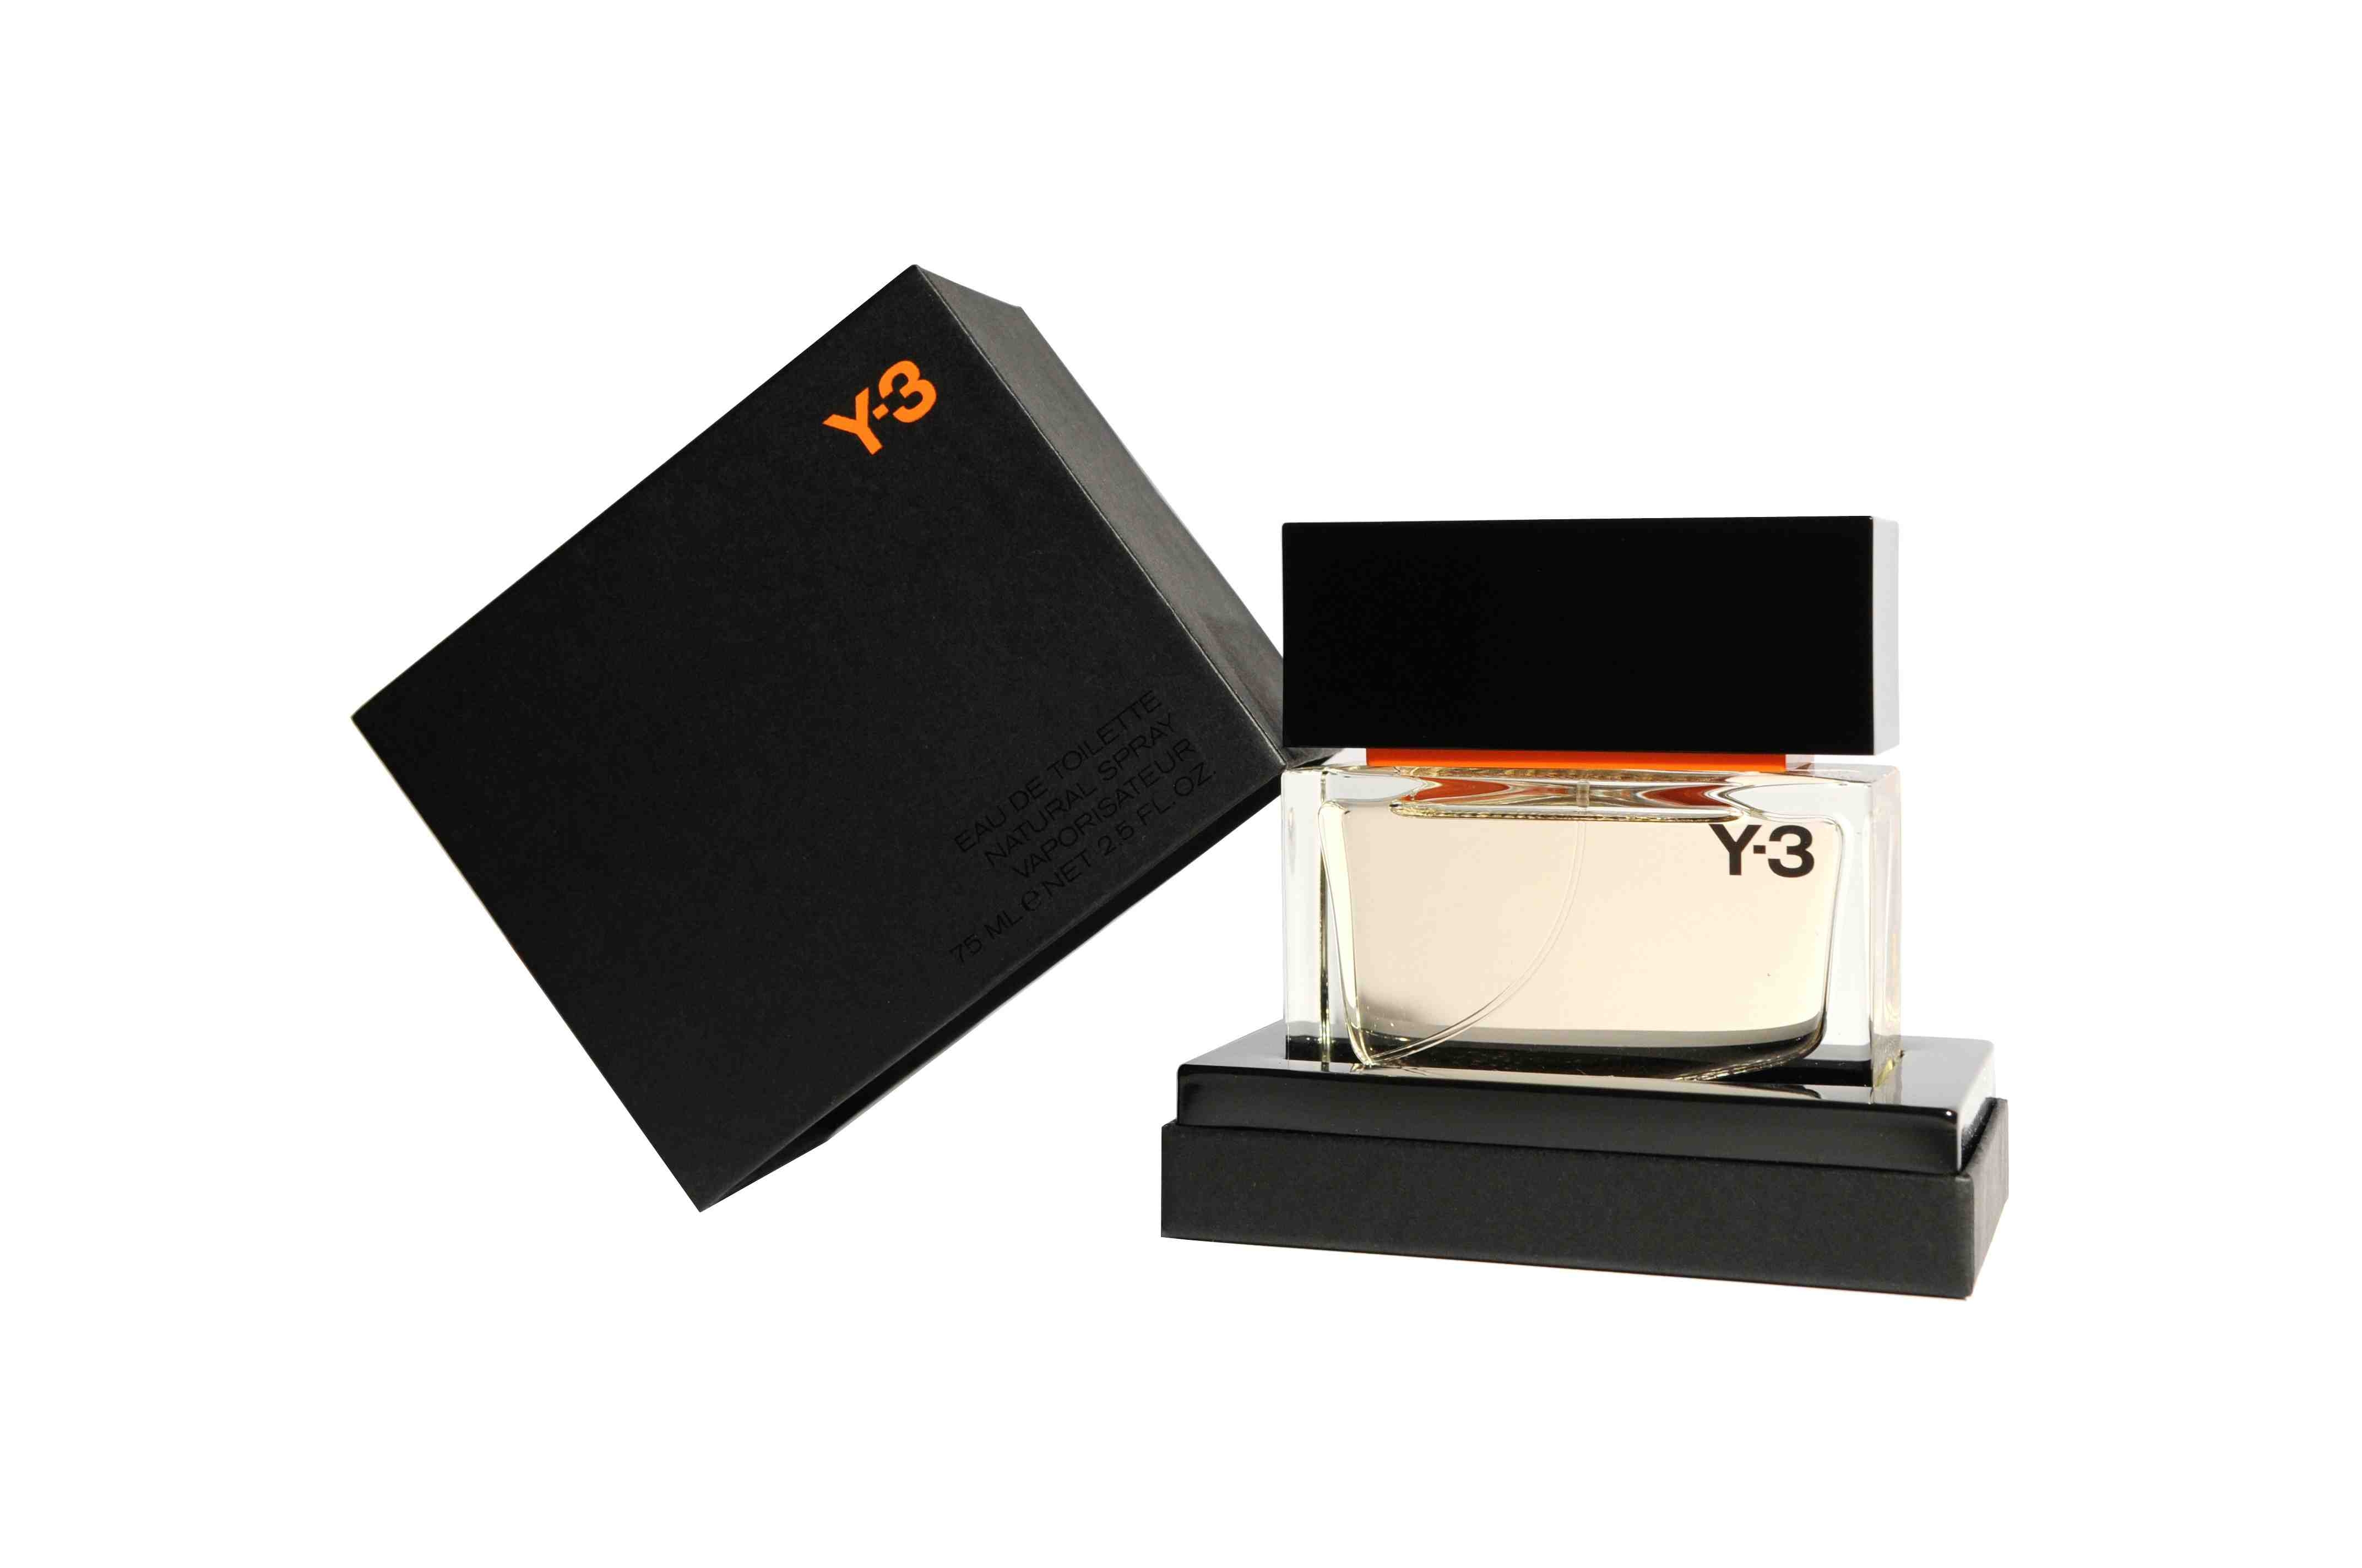 Y-3 Black Label Men's Fragrance designer Yohji Yamamoto Adidas scent cologne tagete elemi pine cardamom cedar wood lavandin black pepper patchouli vetiver tonka vanilla